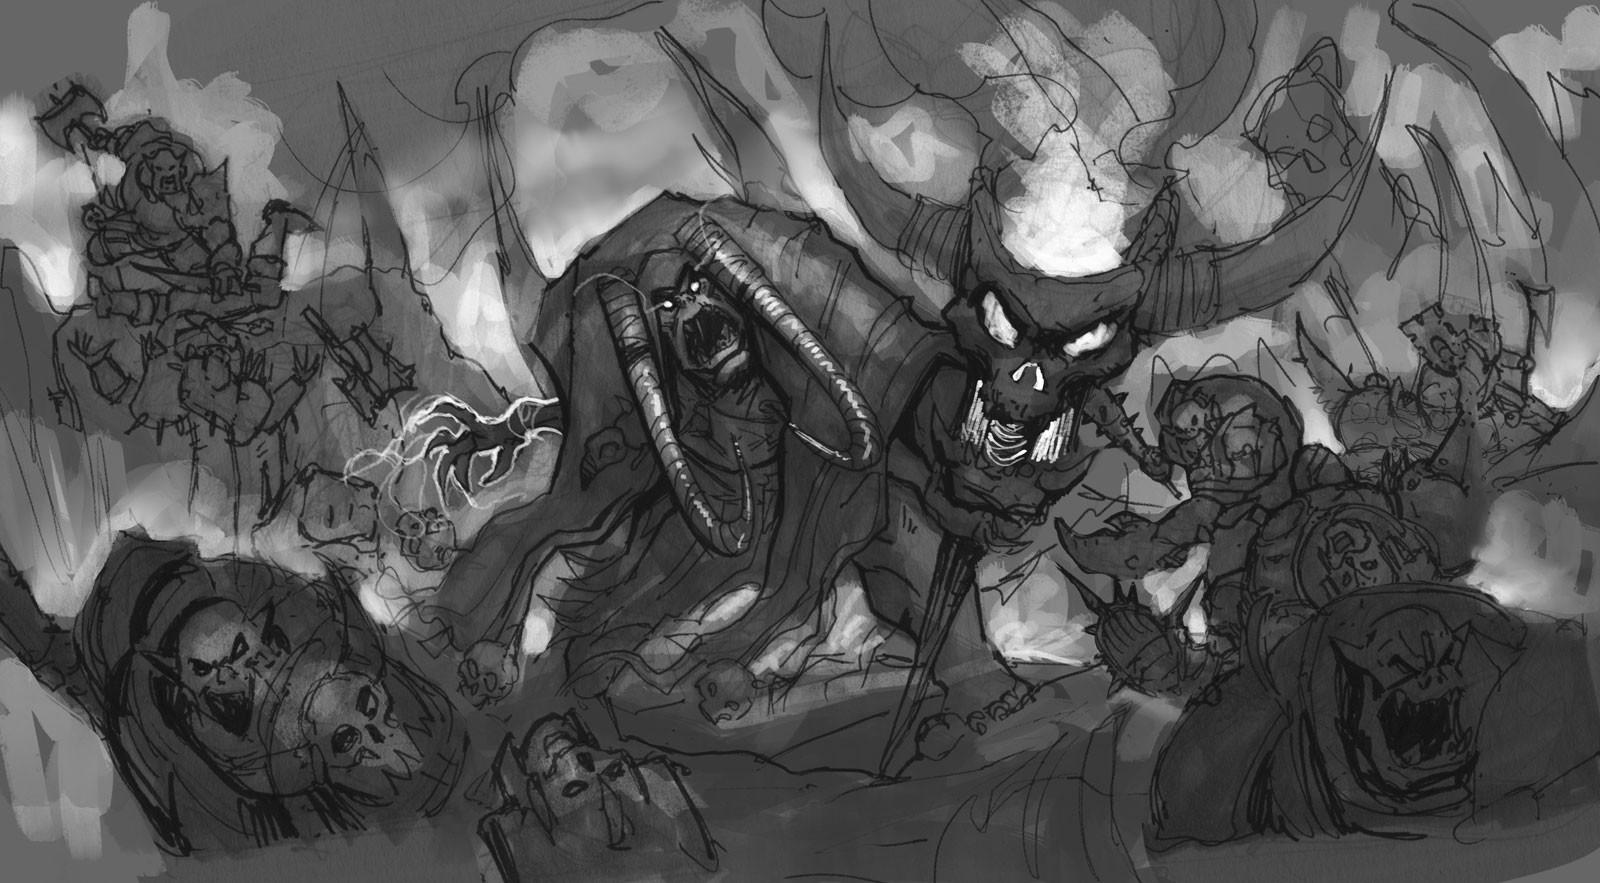 b&W rough sketch